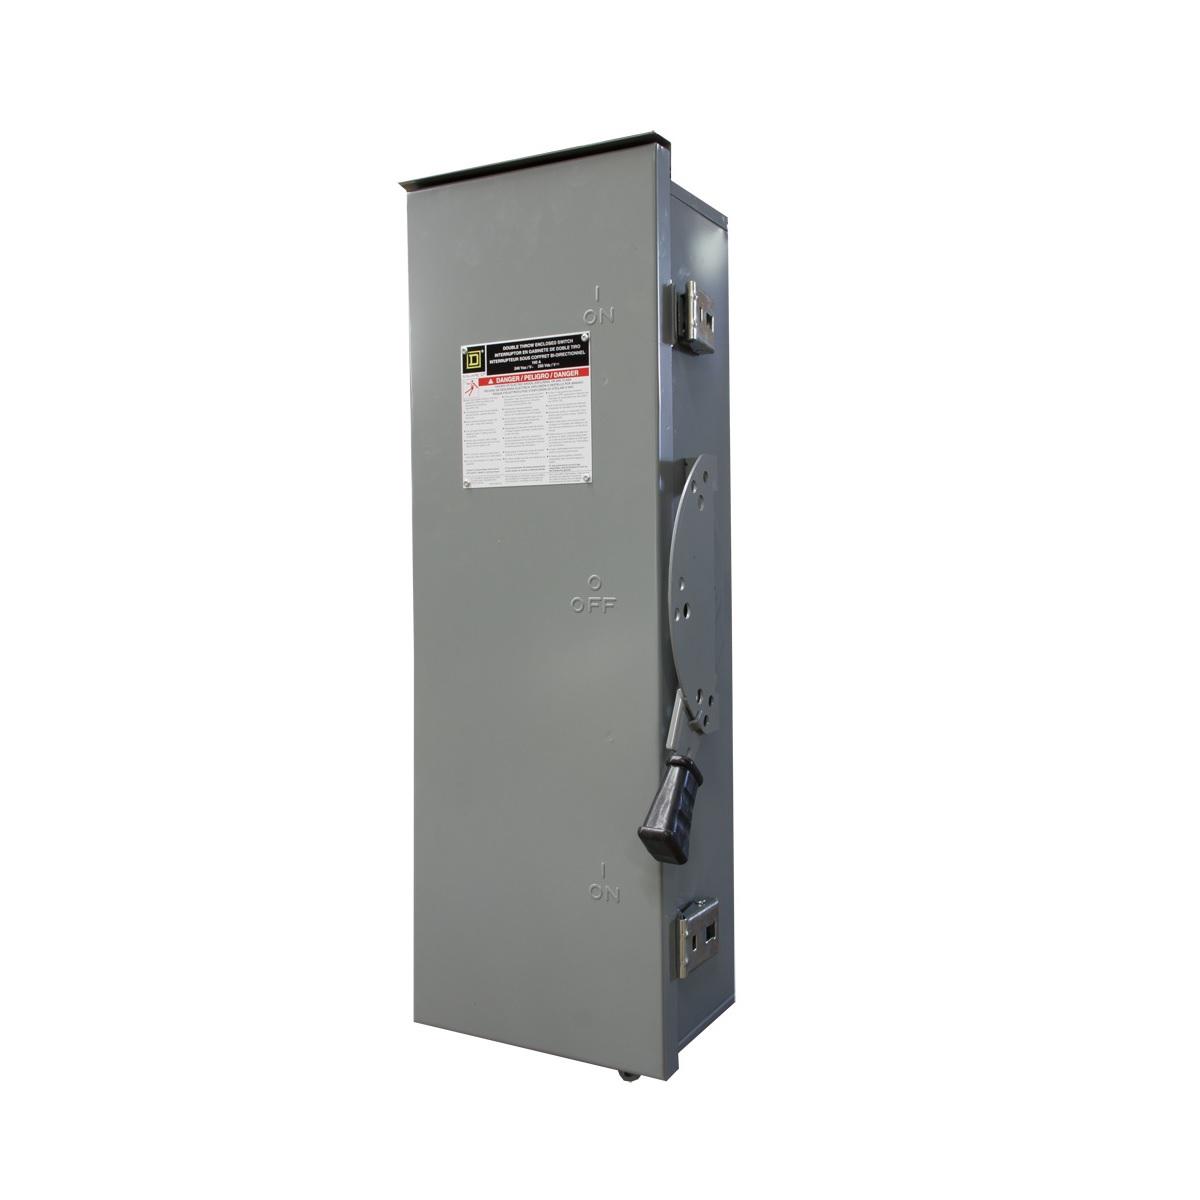 Winco Manual Transfer Switch (3Ph, 100A)